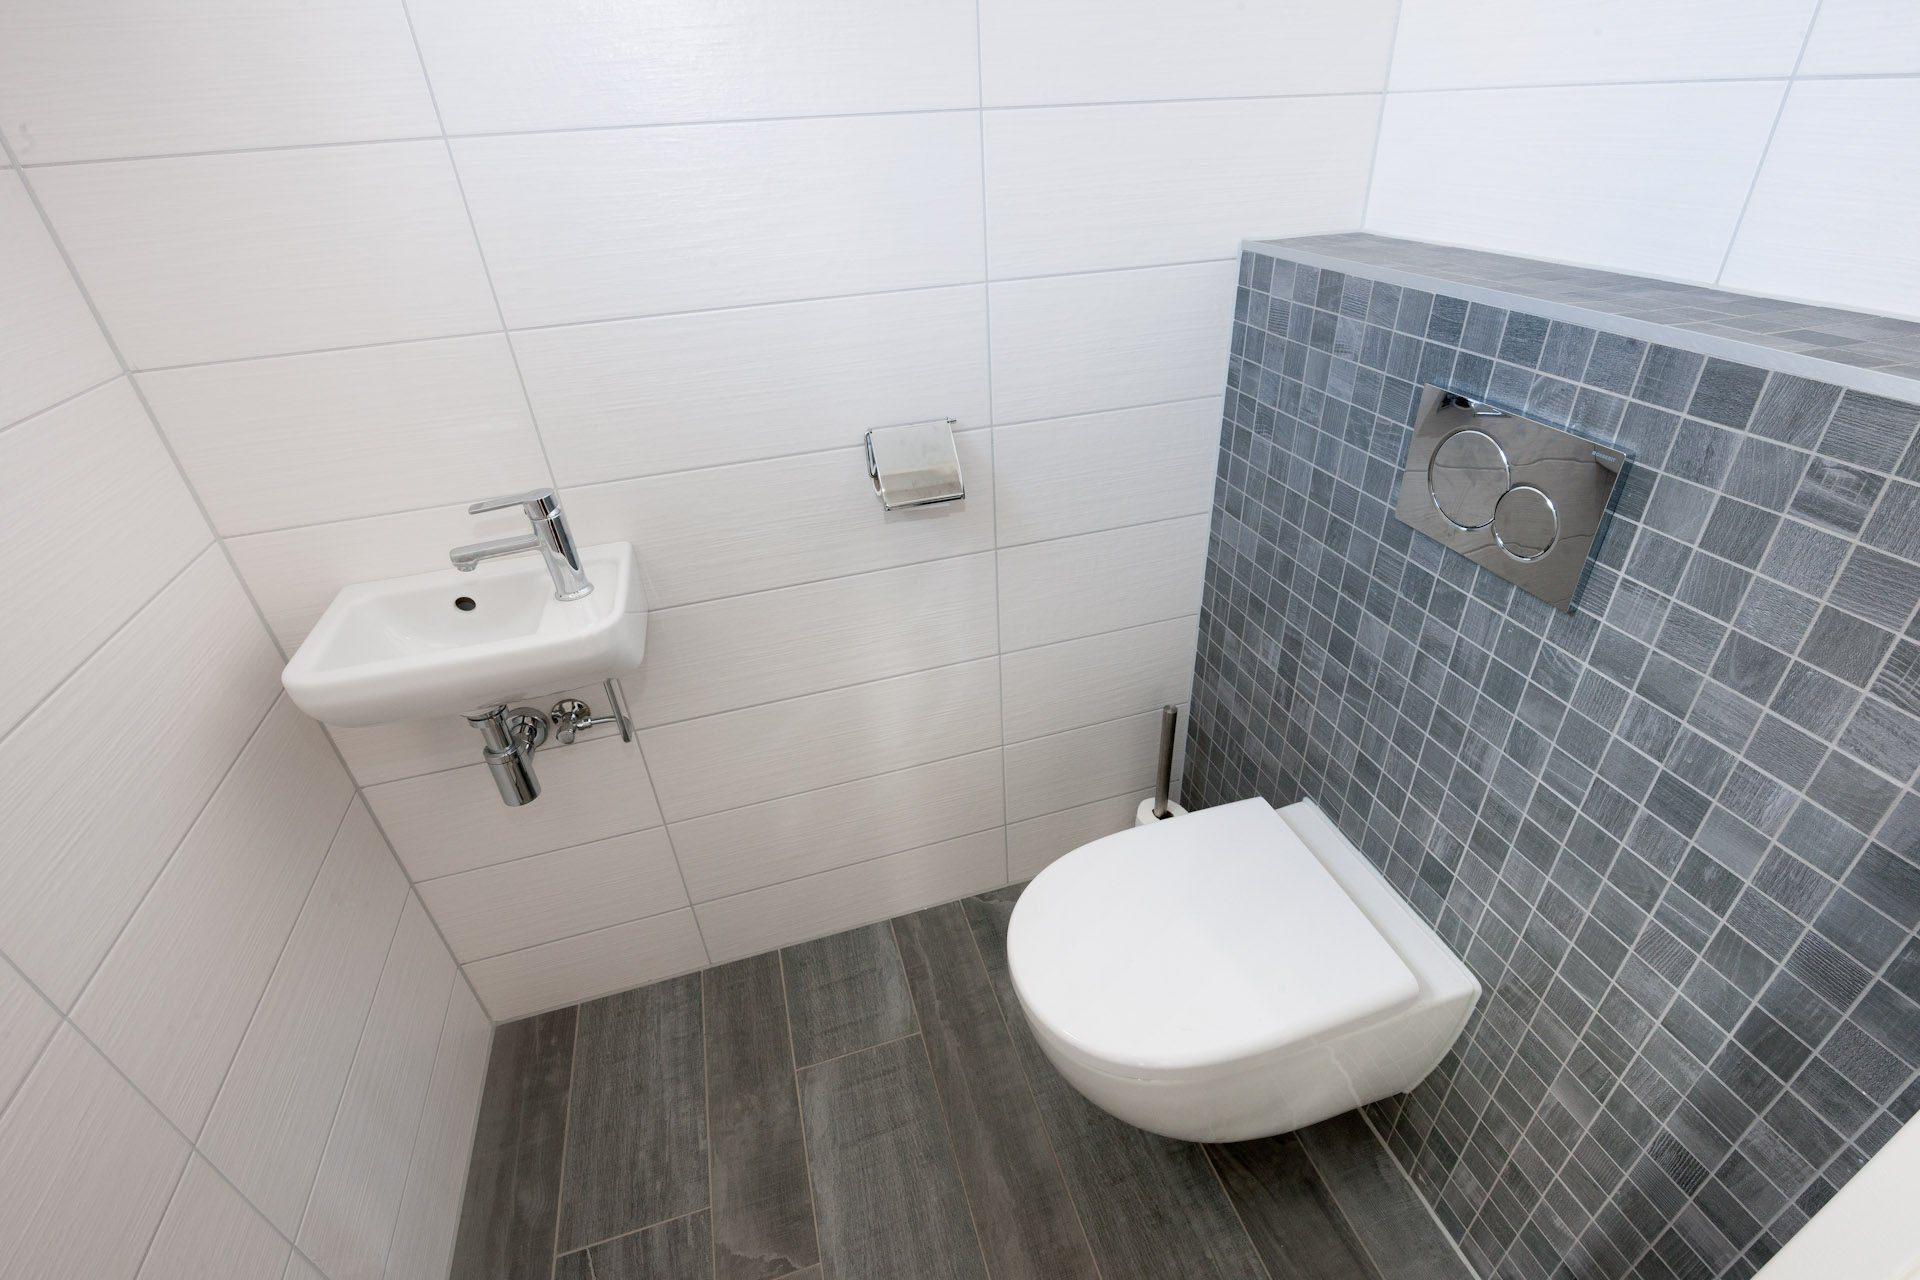 Houtlook tegels in woonkamer en moza ek in toilet kroon - Keramische inrichting badkamer ...